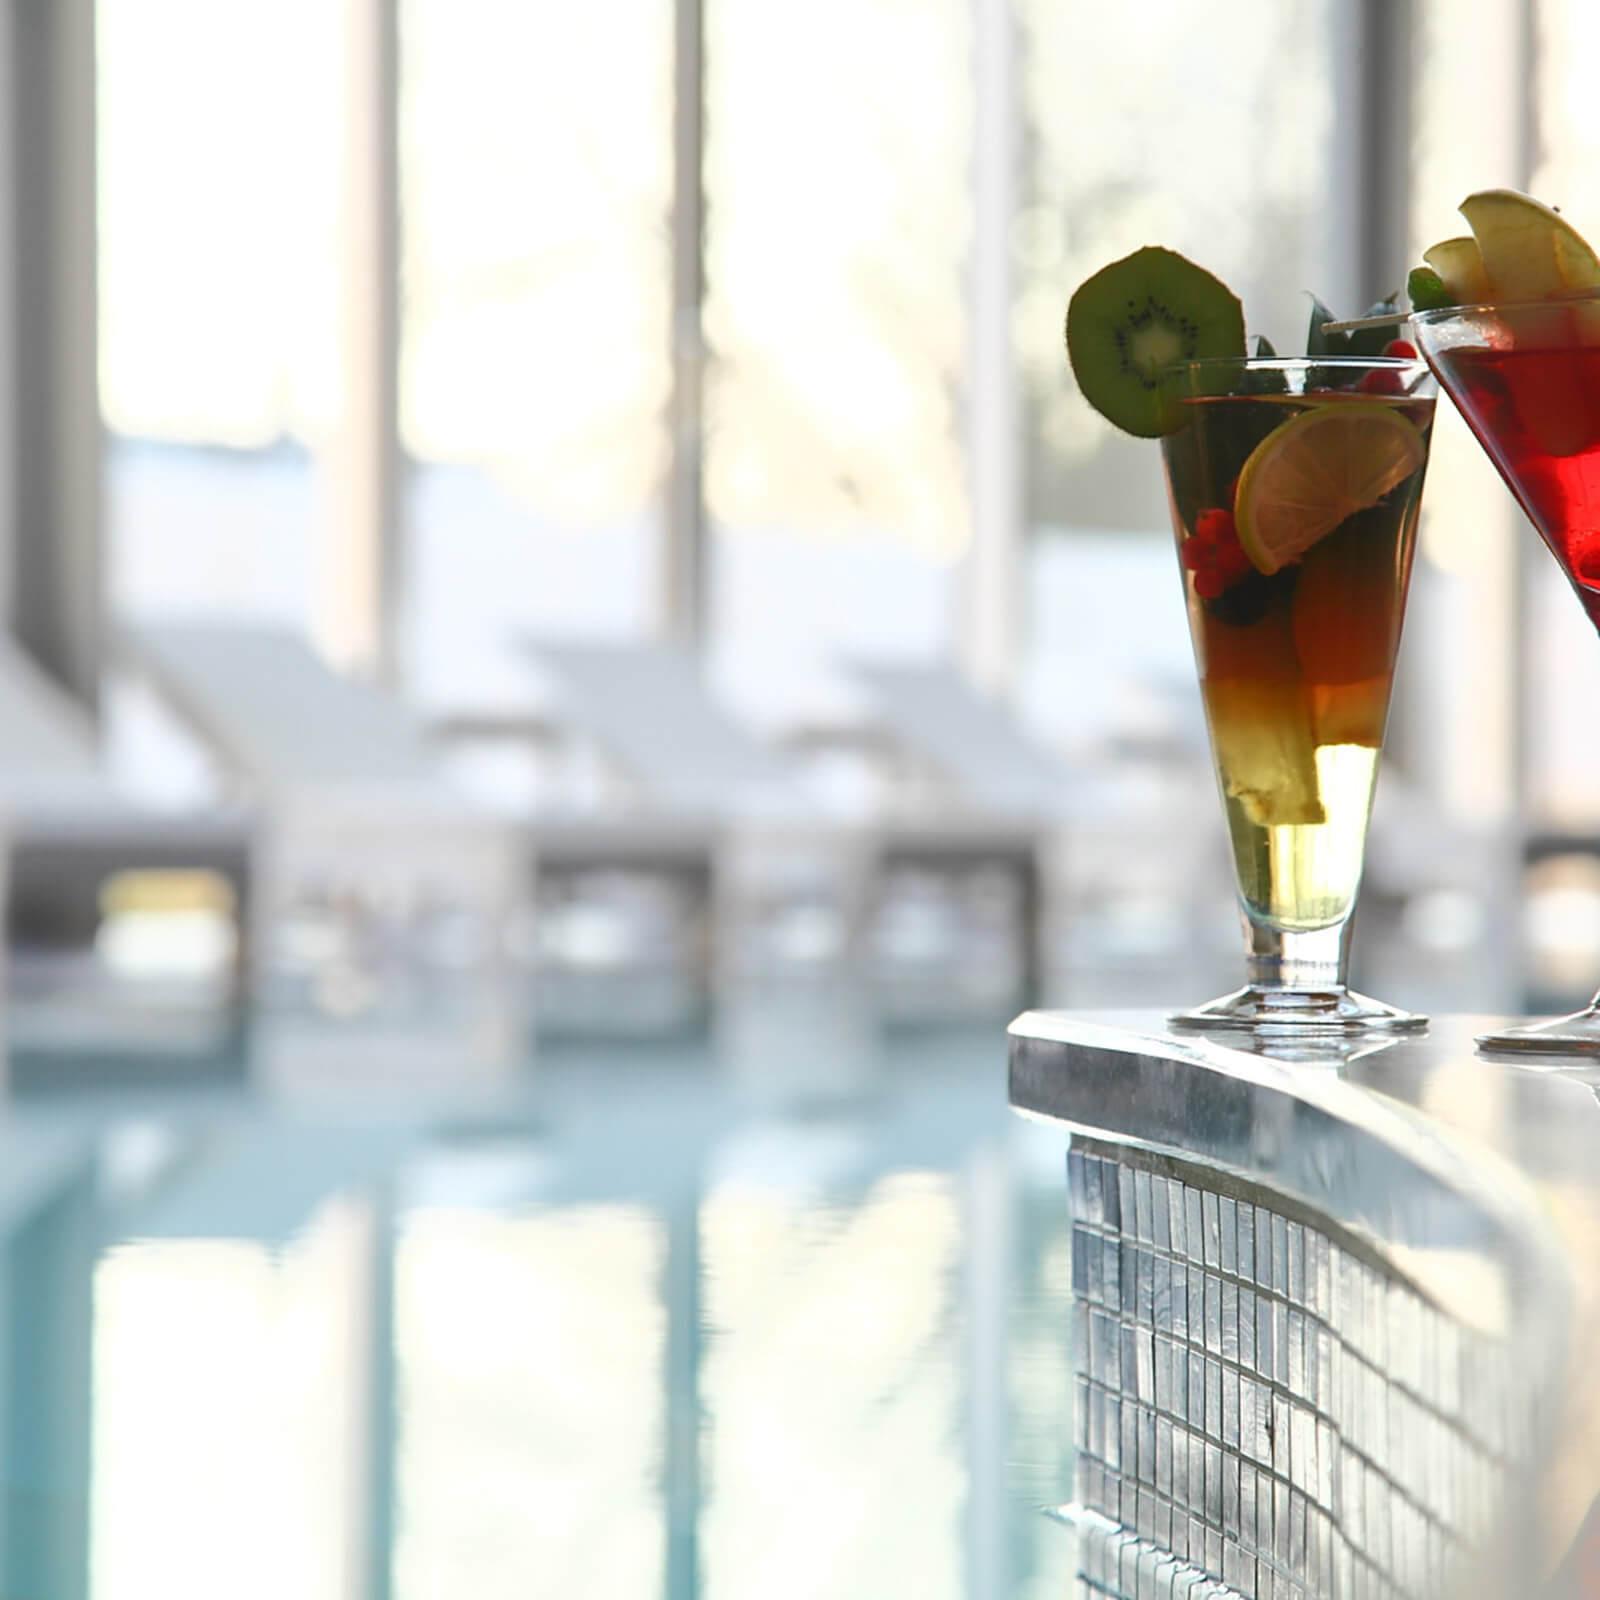 blu-moret-wellness-spa-centro-benessere-udine-piscina-cocktail